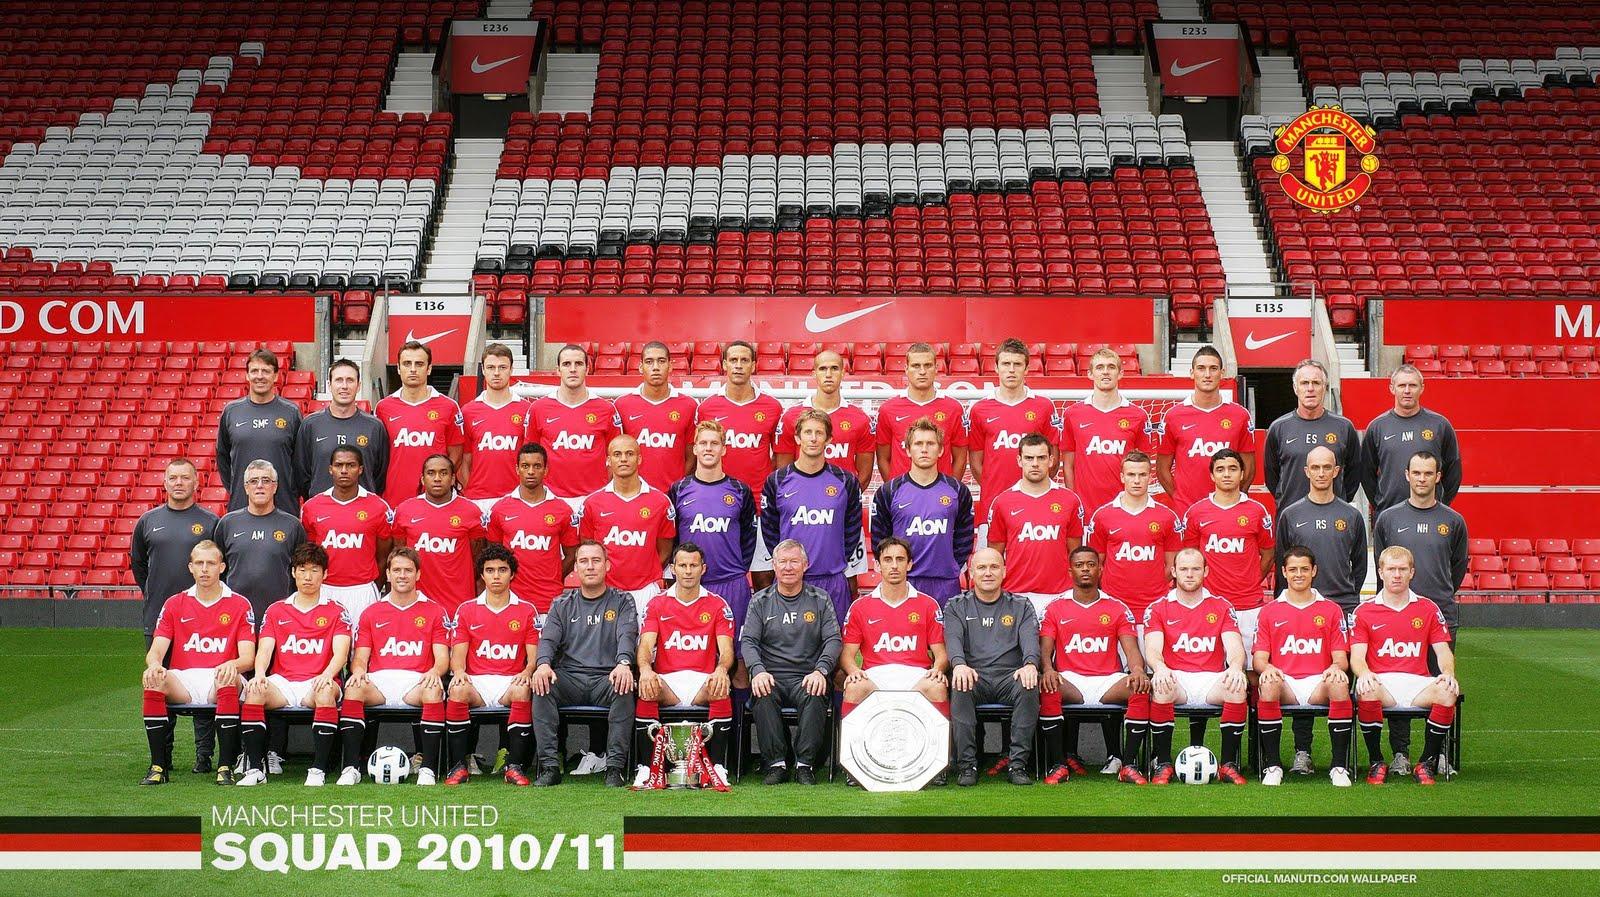 manchester_united_squad_photo_2010-2011.jpg